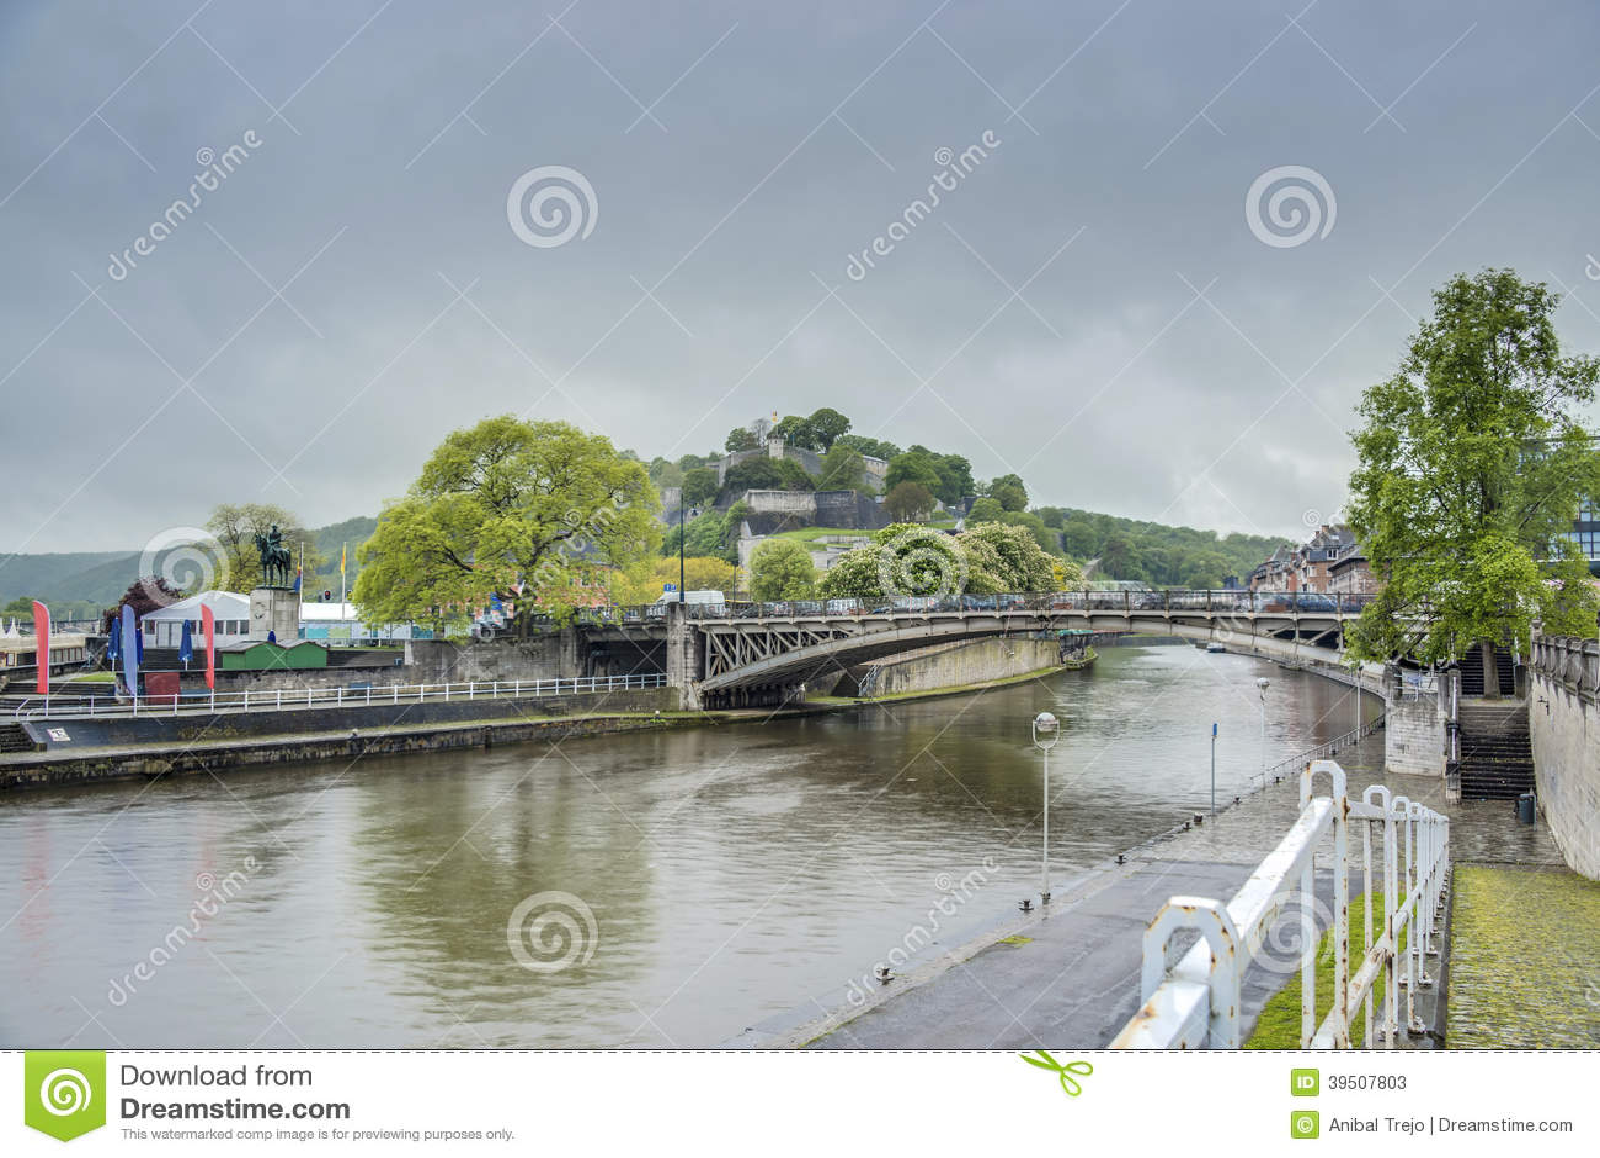 Namur Citadel, Wallonia Region, Belgium